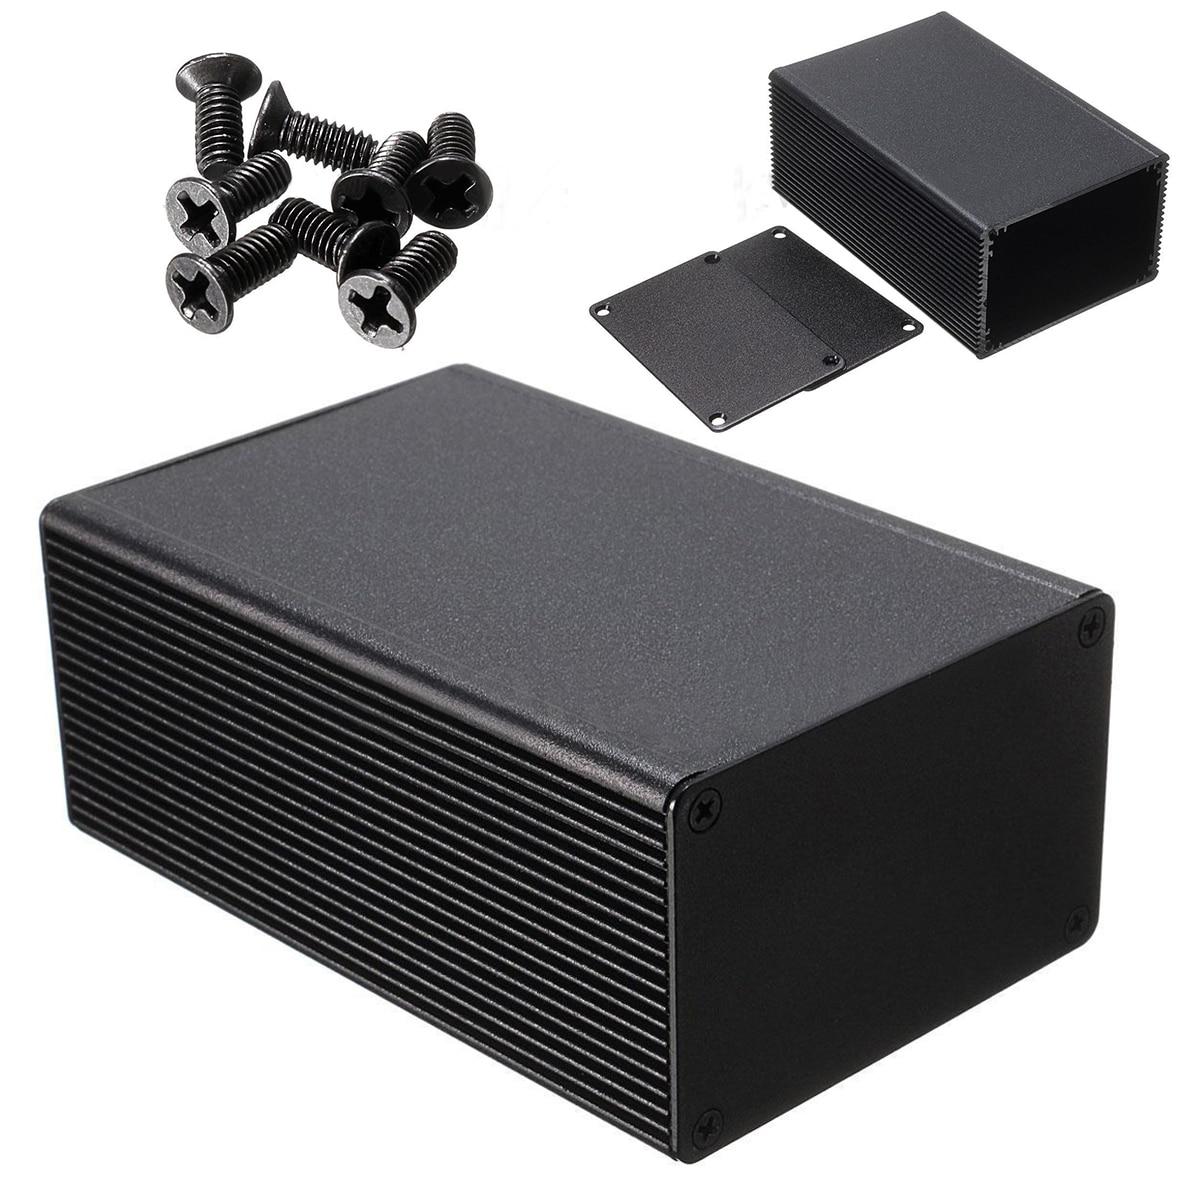 1pc Aluminum Alloy Electronic PCB Instrument Case Black Enclosure Box 100x66x43mm Durable With 8pcs Screws